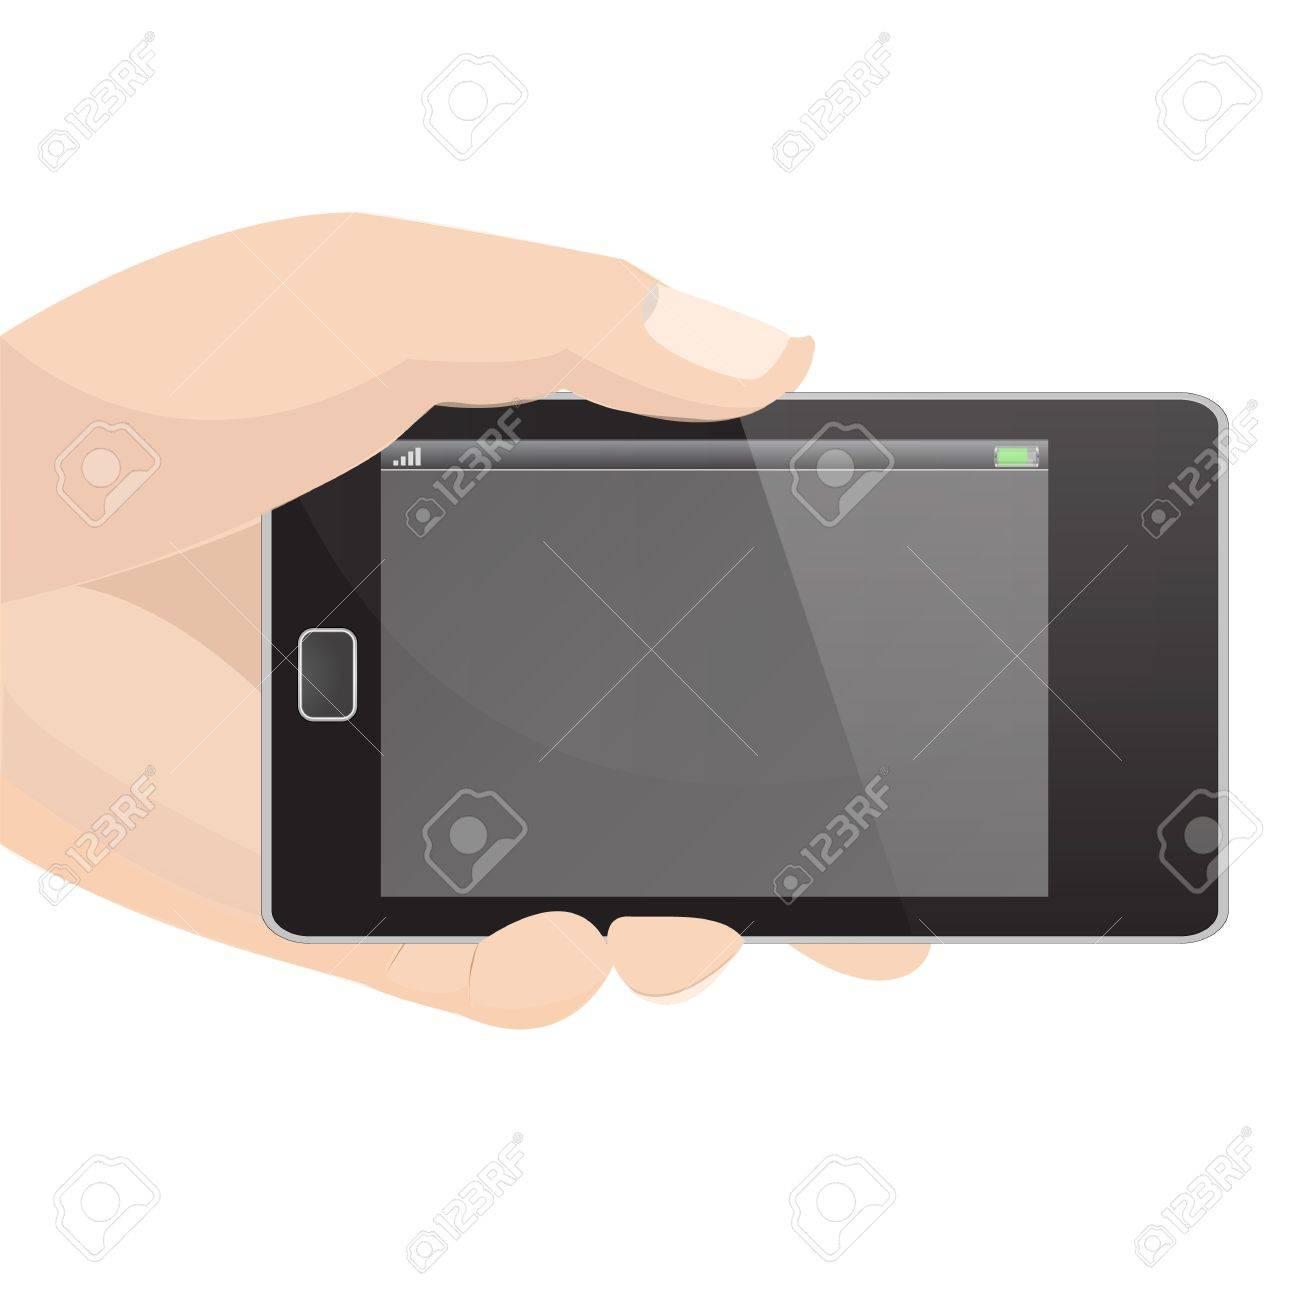 Horizontal Smart Phone Vector in hand holding graphic vector eps10 Stock Vector - 18496142